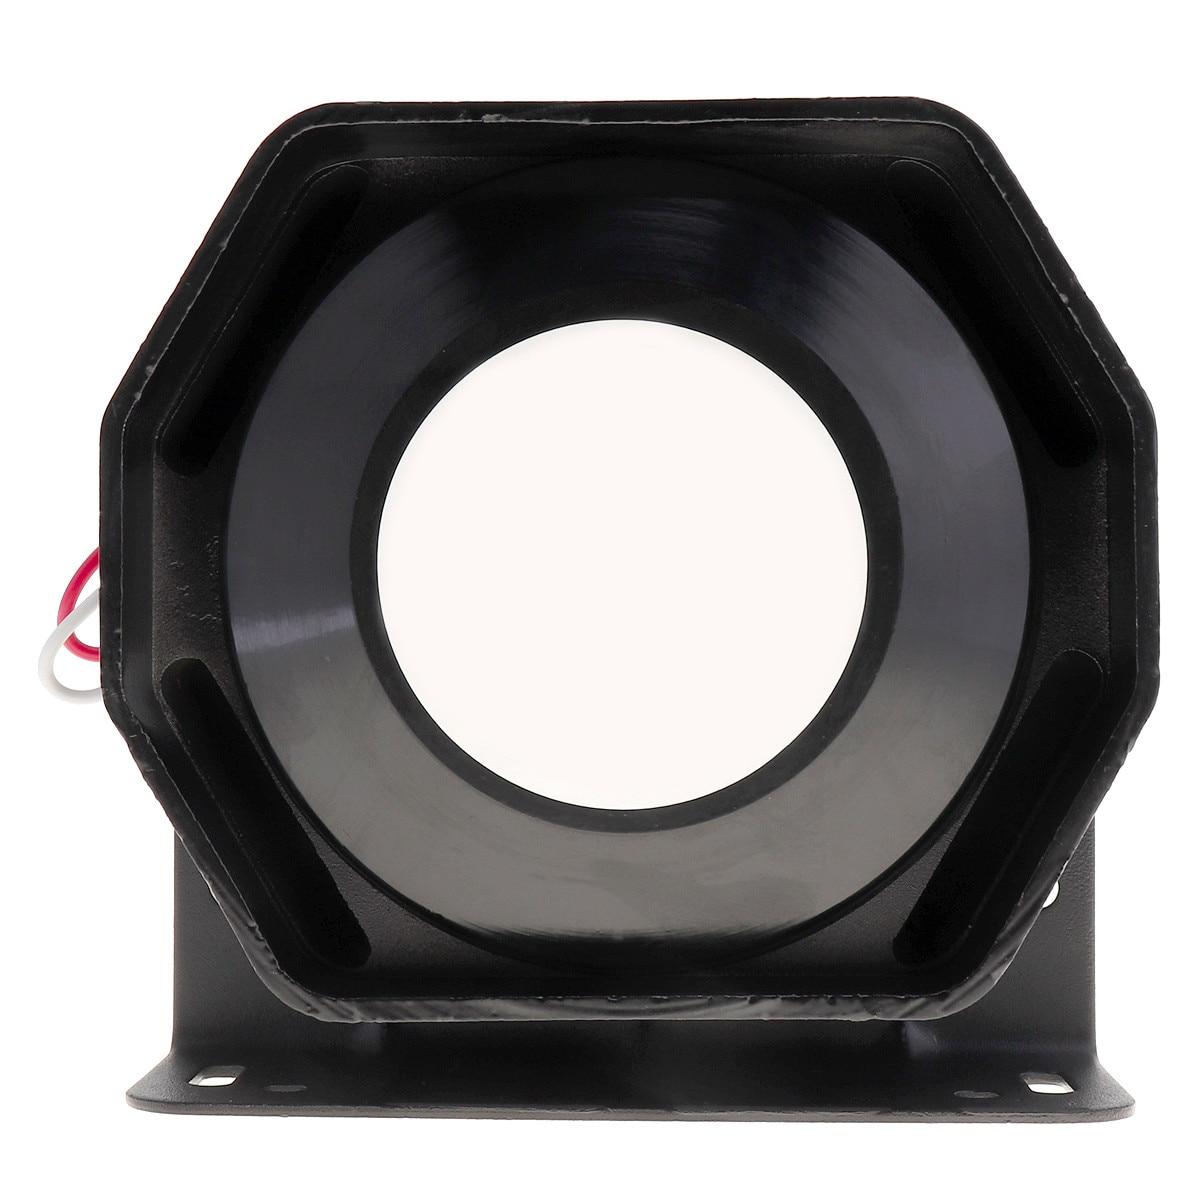 Universal 12V 200W Compact Loud Speaker PA System Emergency Warning Auto Car Siren Horn